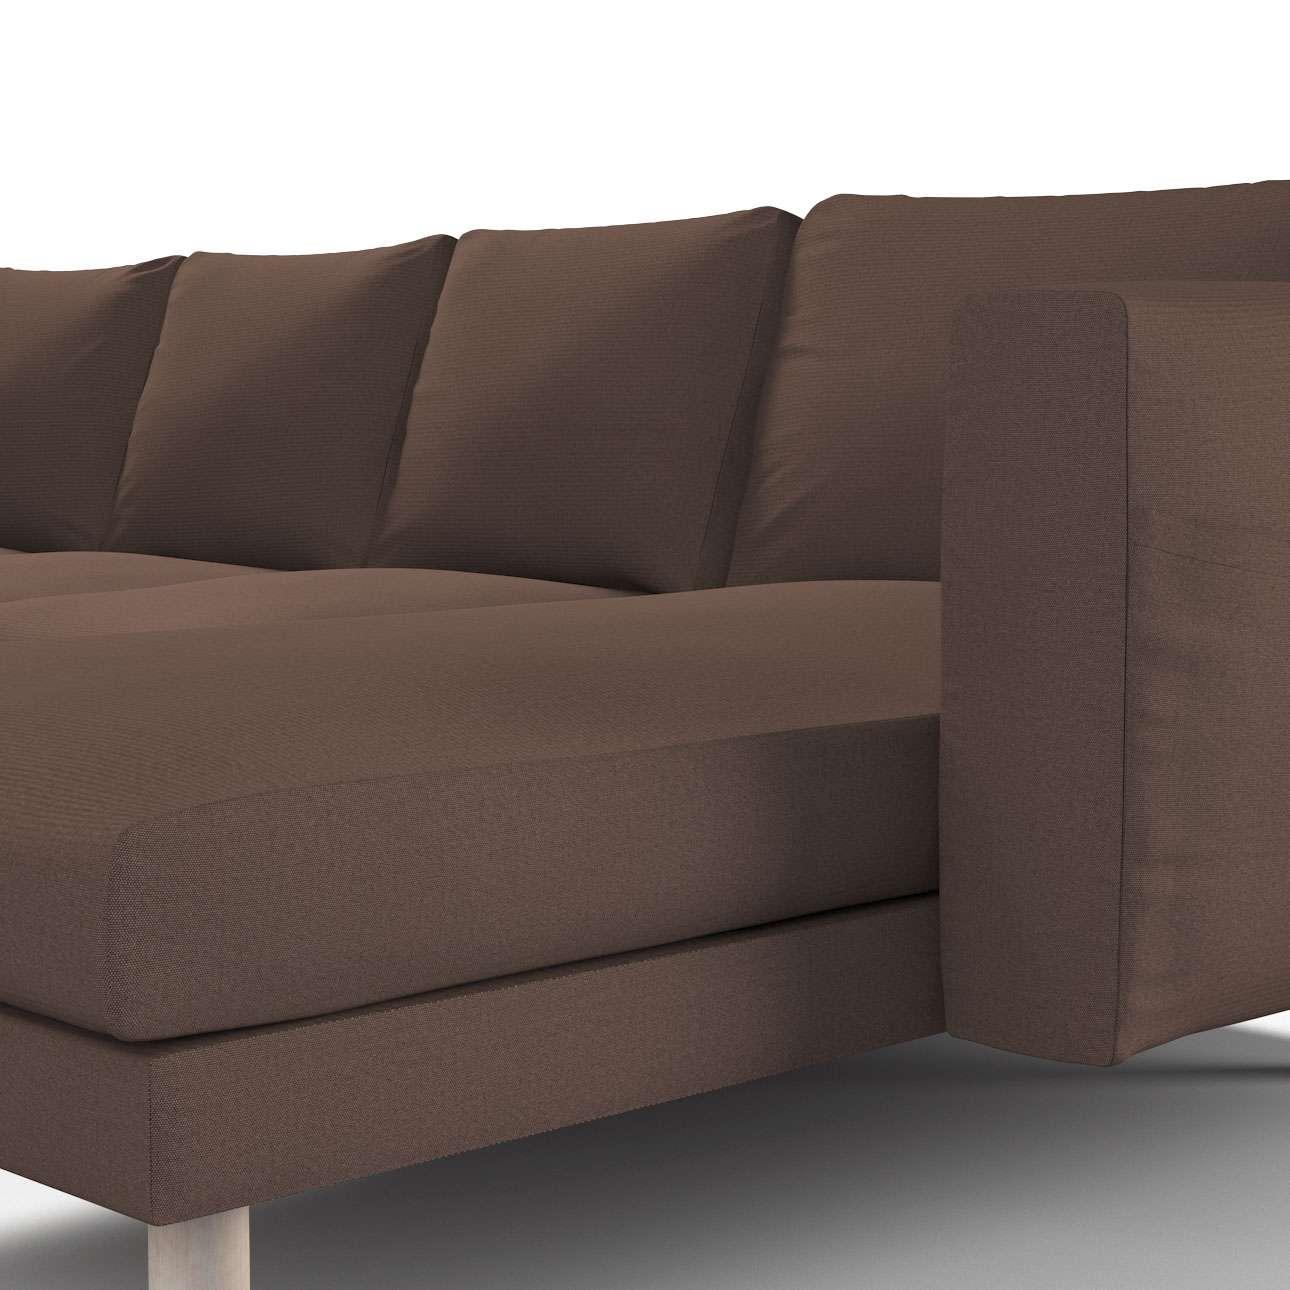 norsborg bezug f r 4 sitzer sofa mit recamiere braun. Black Bedroom Furniture Sets. Home Design Ideas